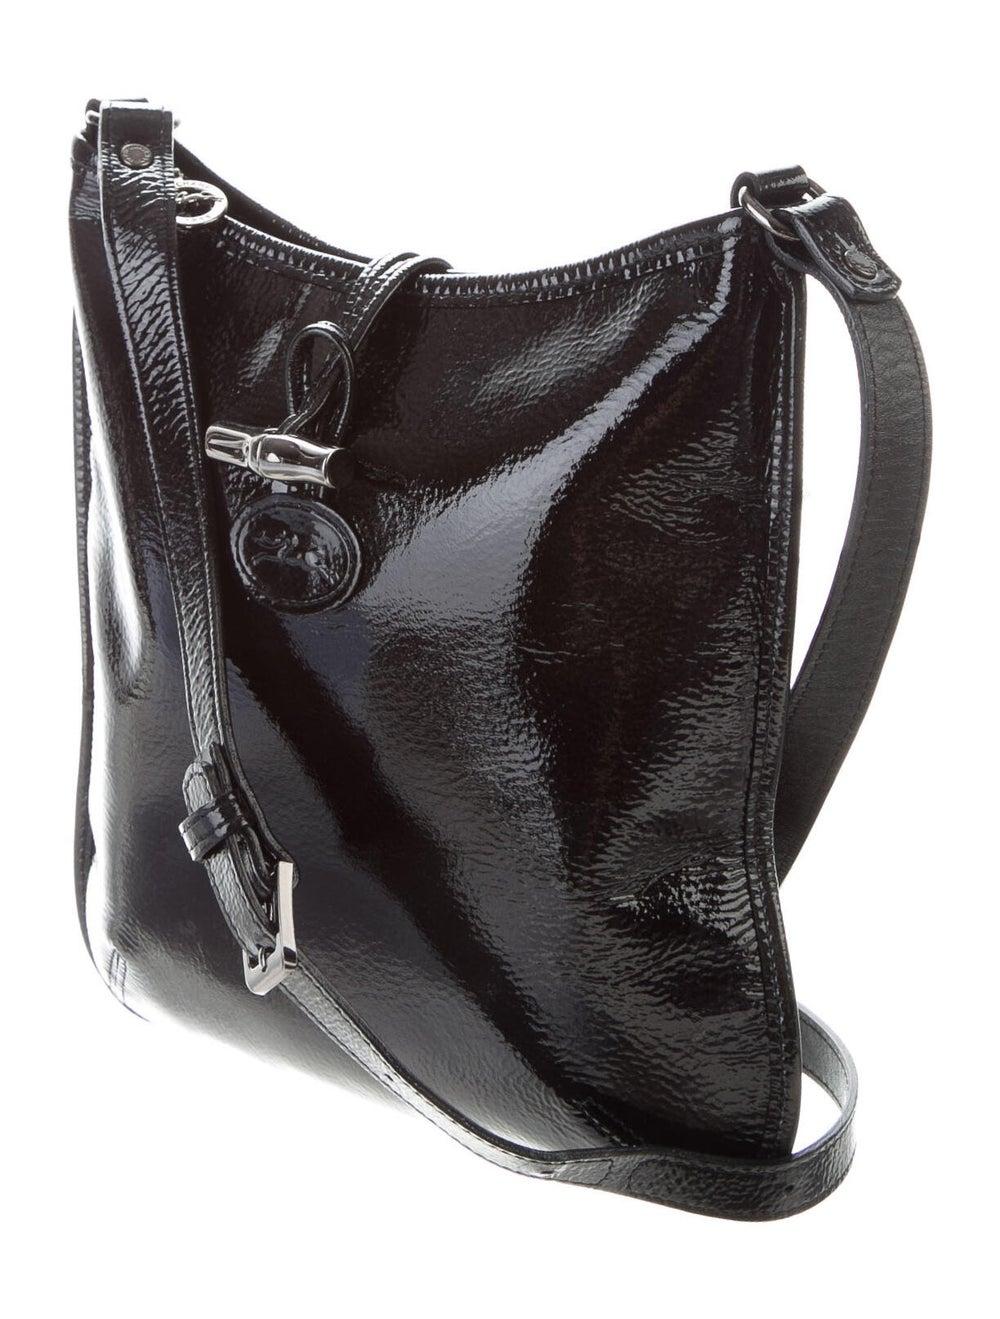 Longchamp Patent Leather Crossbody Bag Black - image 3